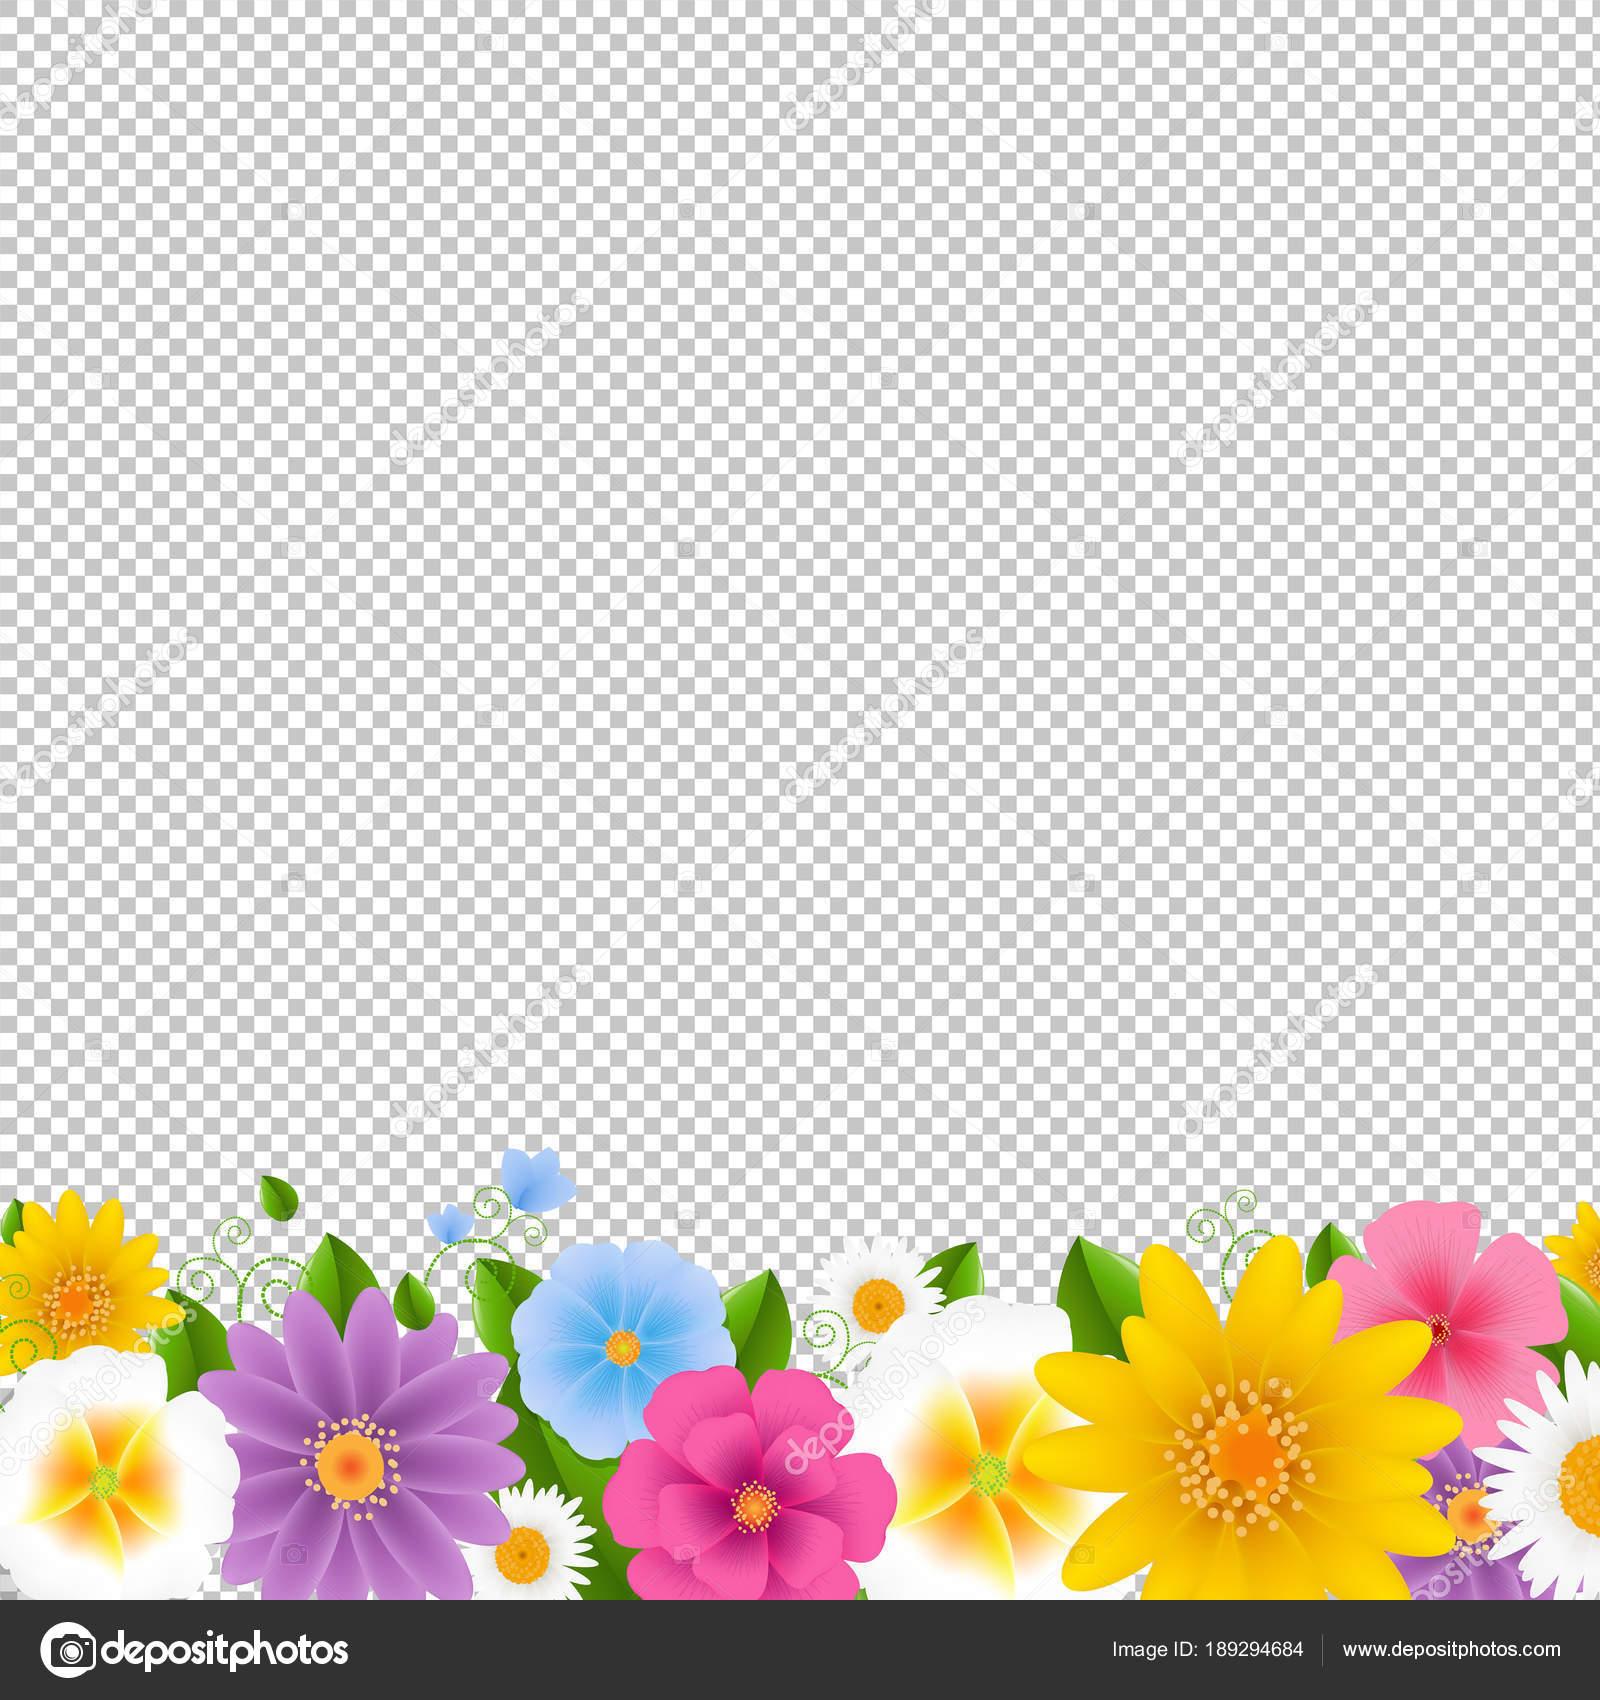 Flowers Border Transparent Background Gradient Mesh Vector Illustration Stock